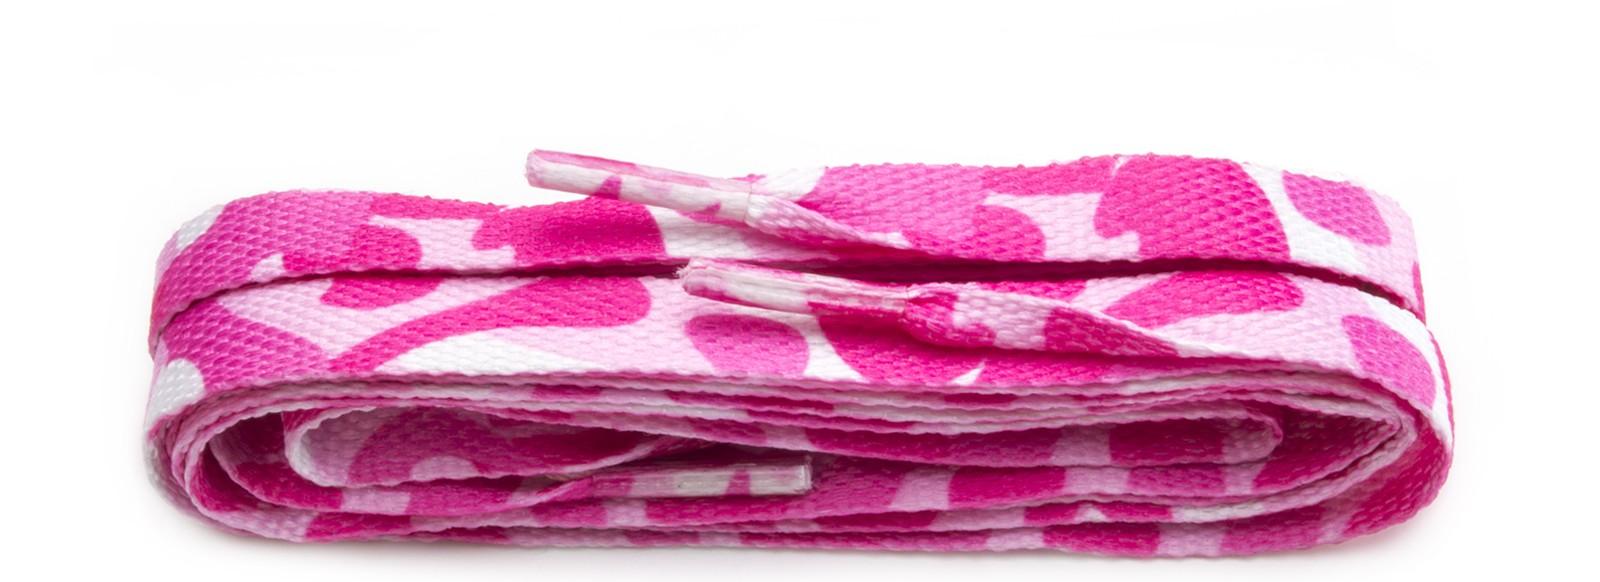 Sneaker Pink Camo Printed Narrow